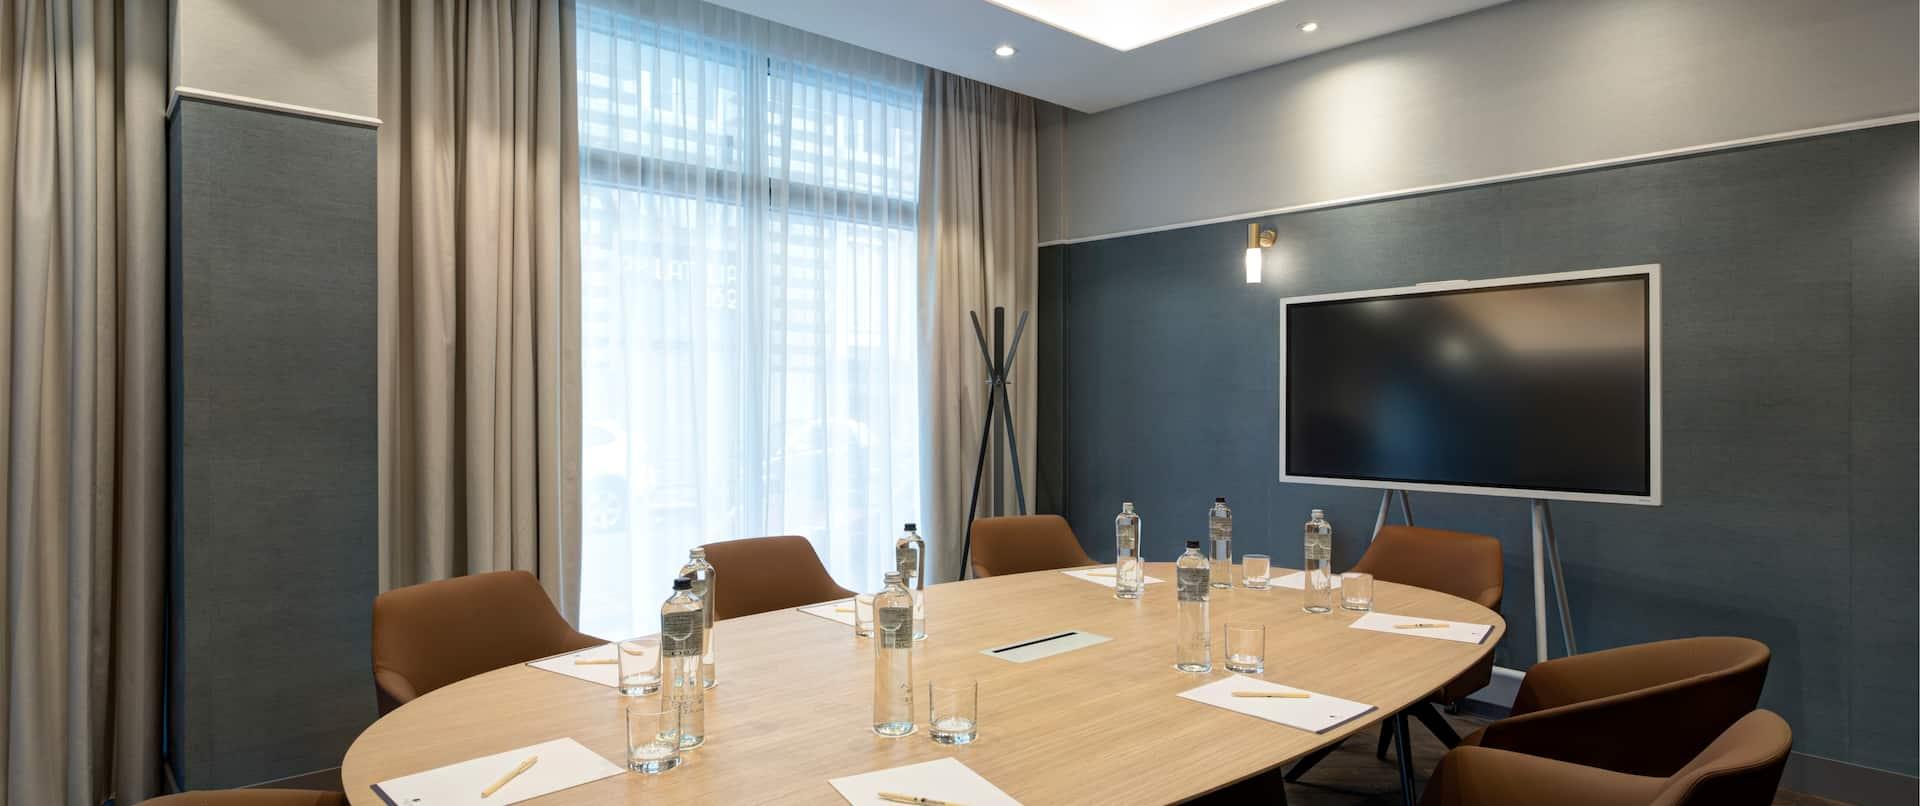 Cavour boardroom meeting room